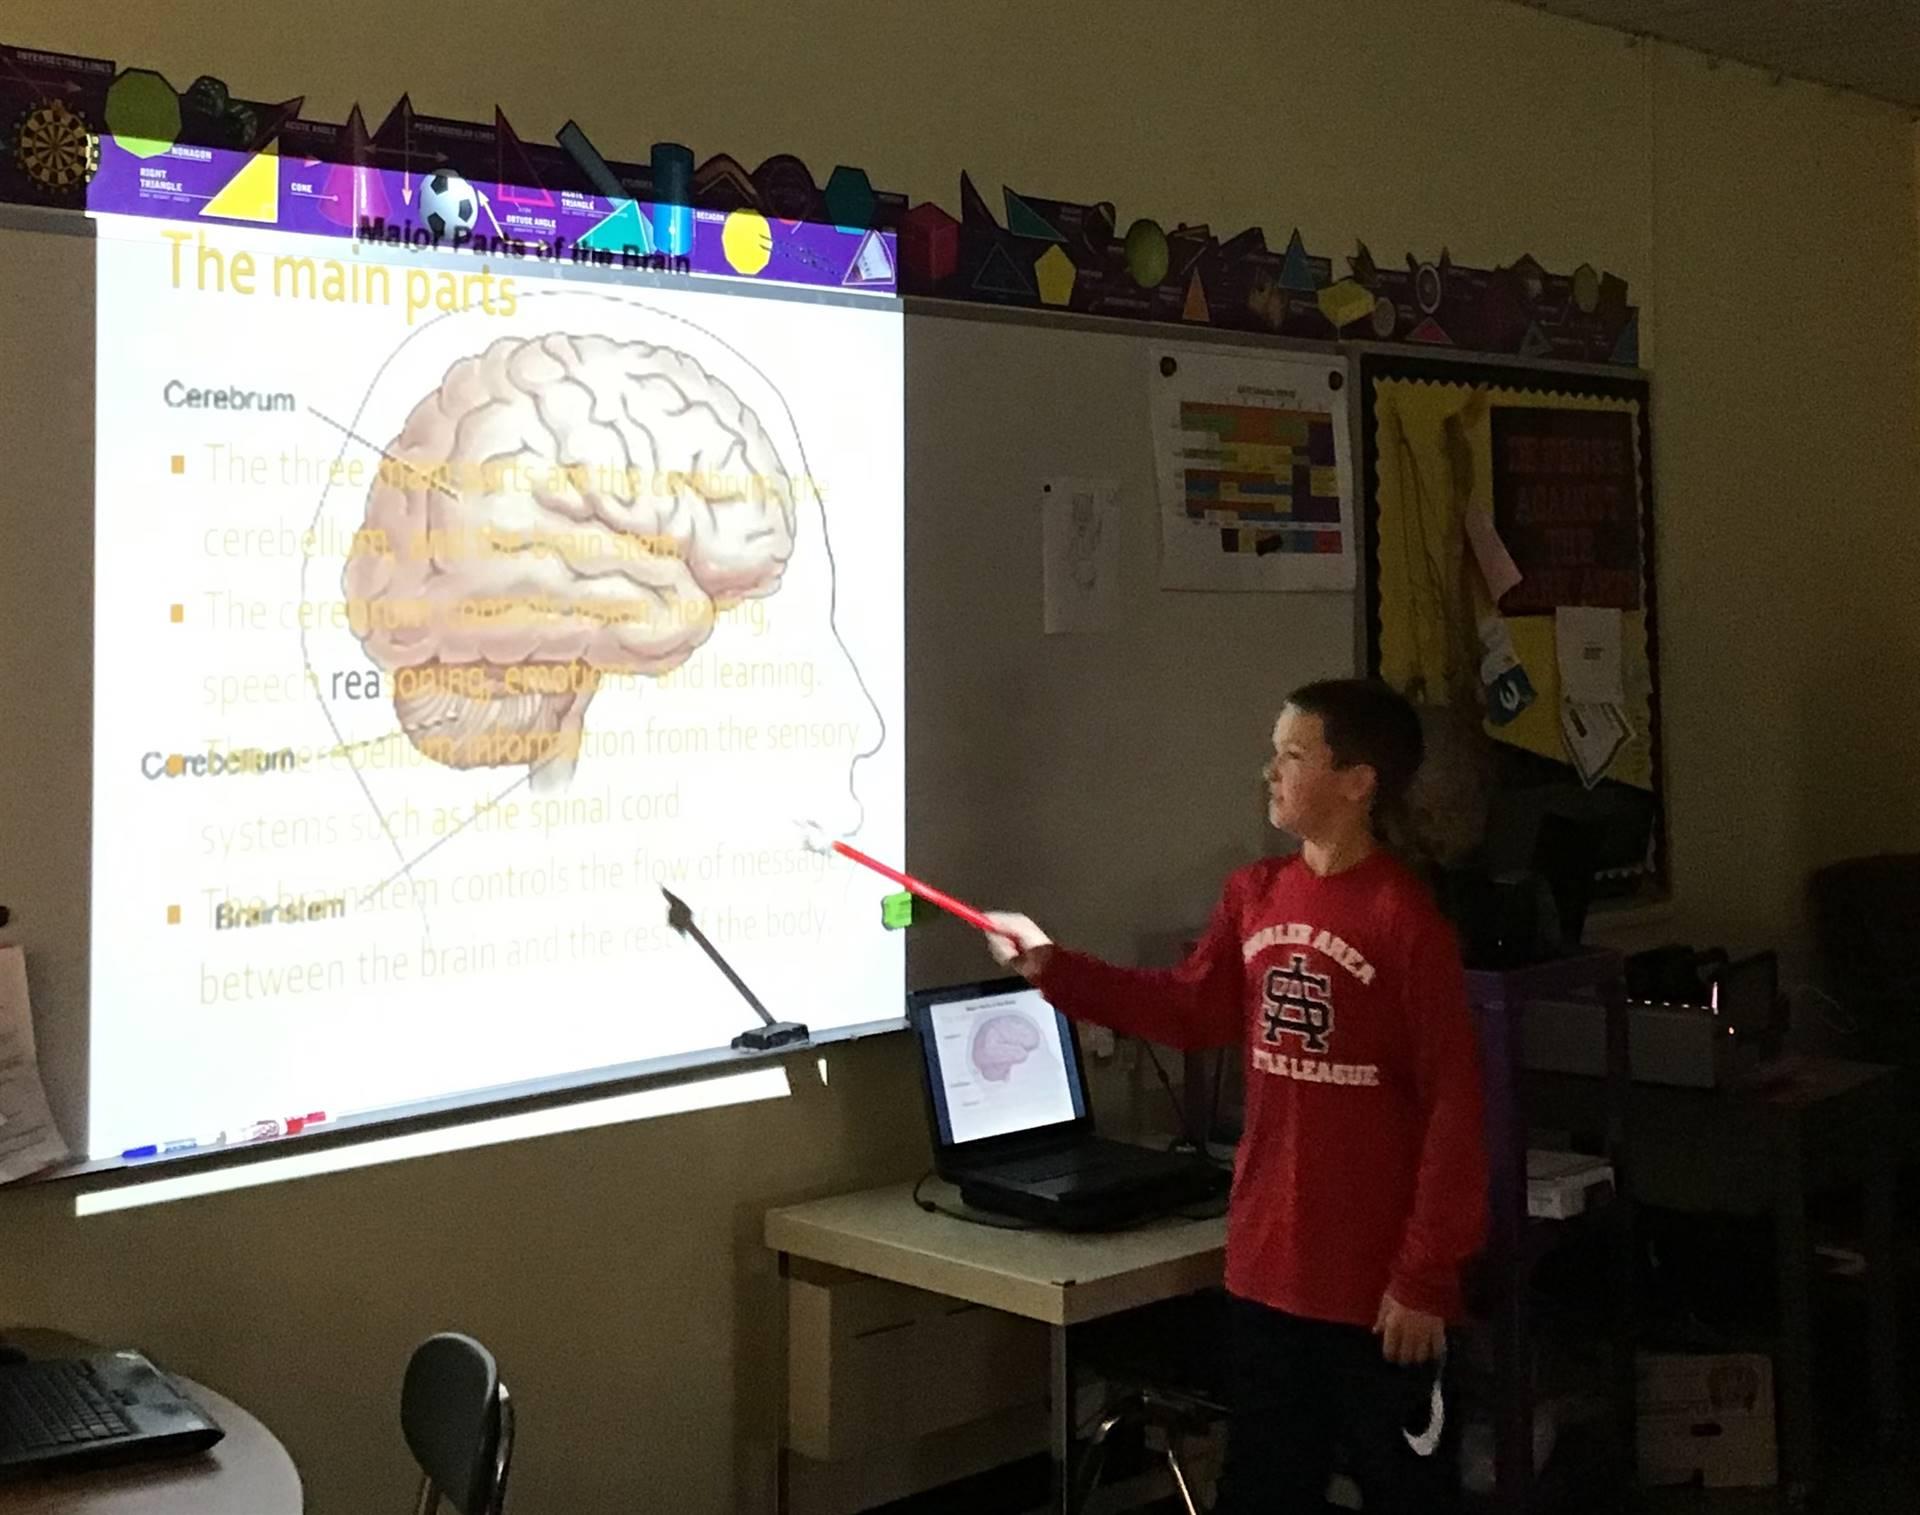 5th grader presenting